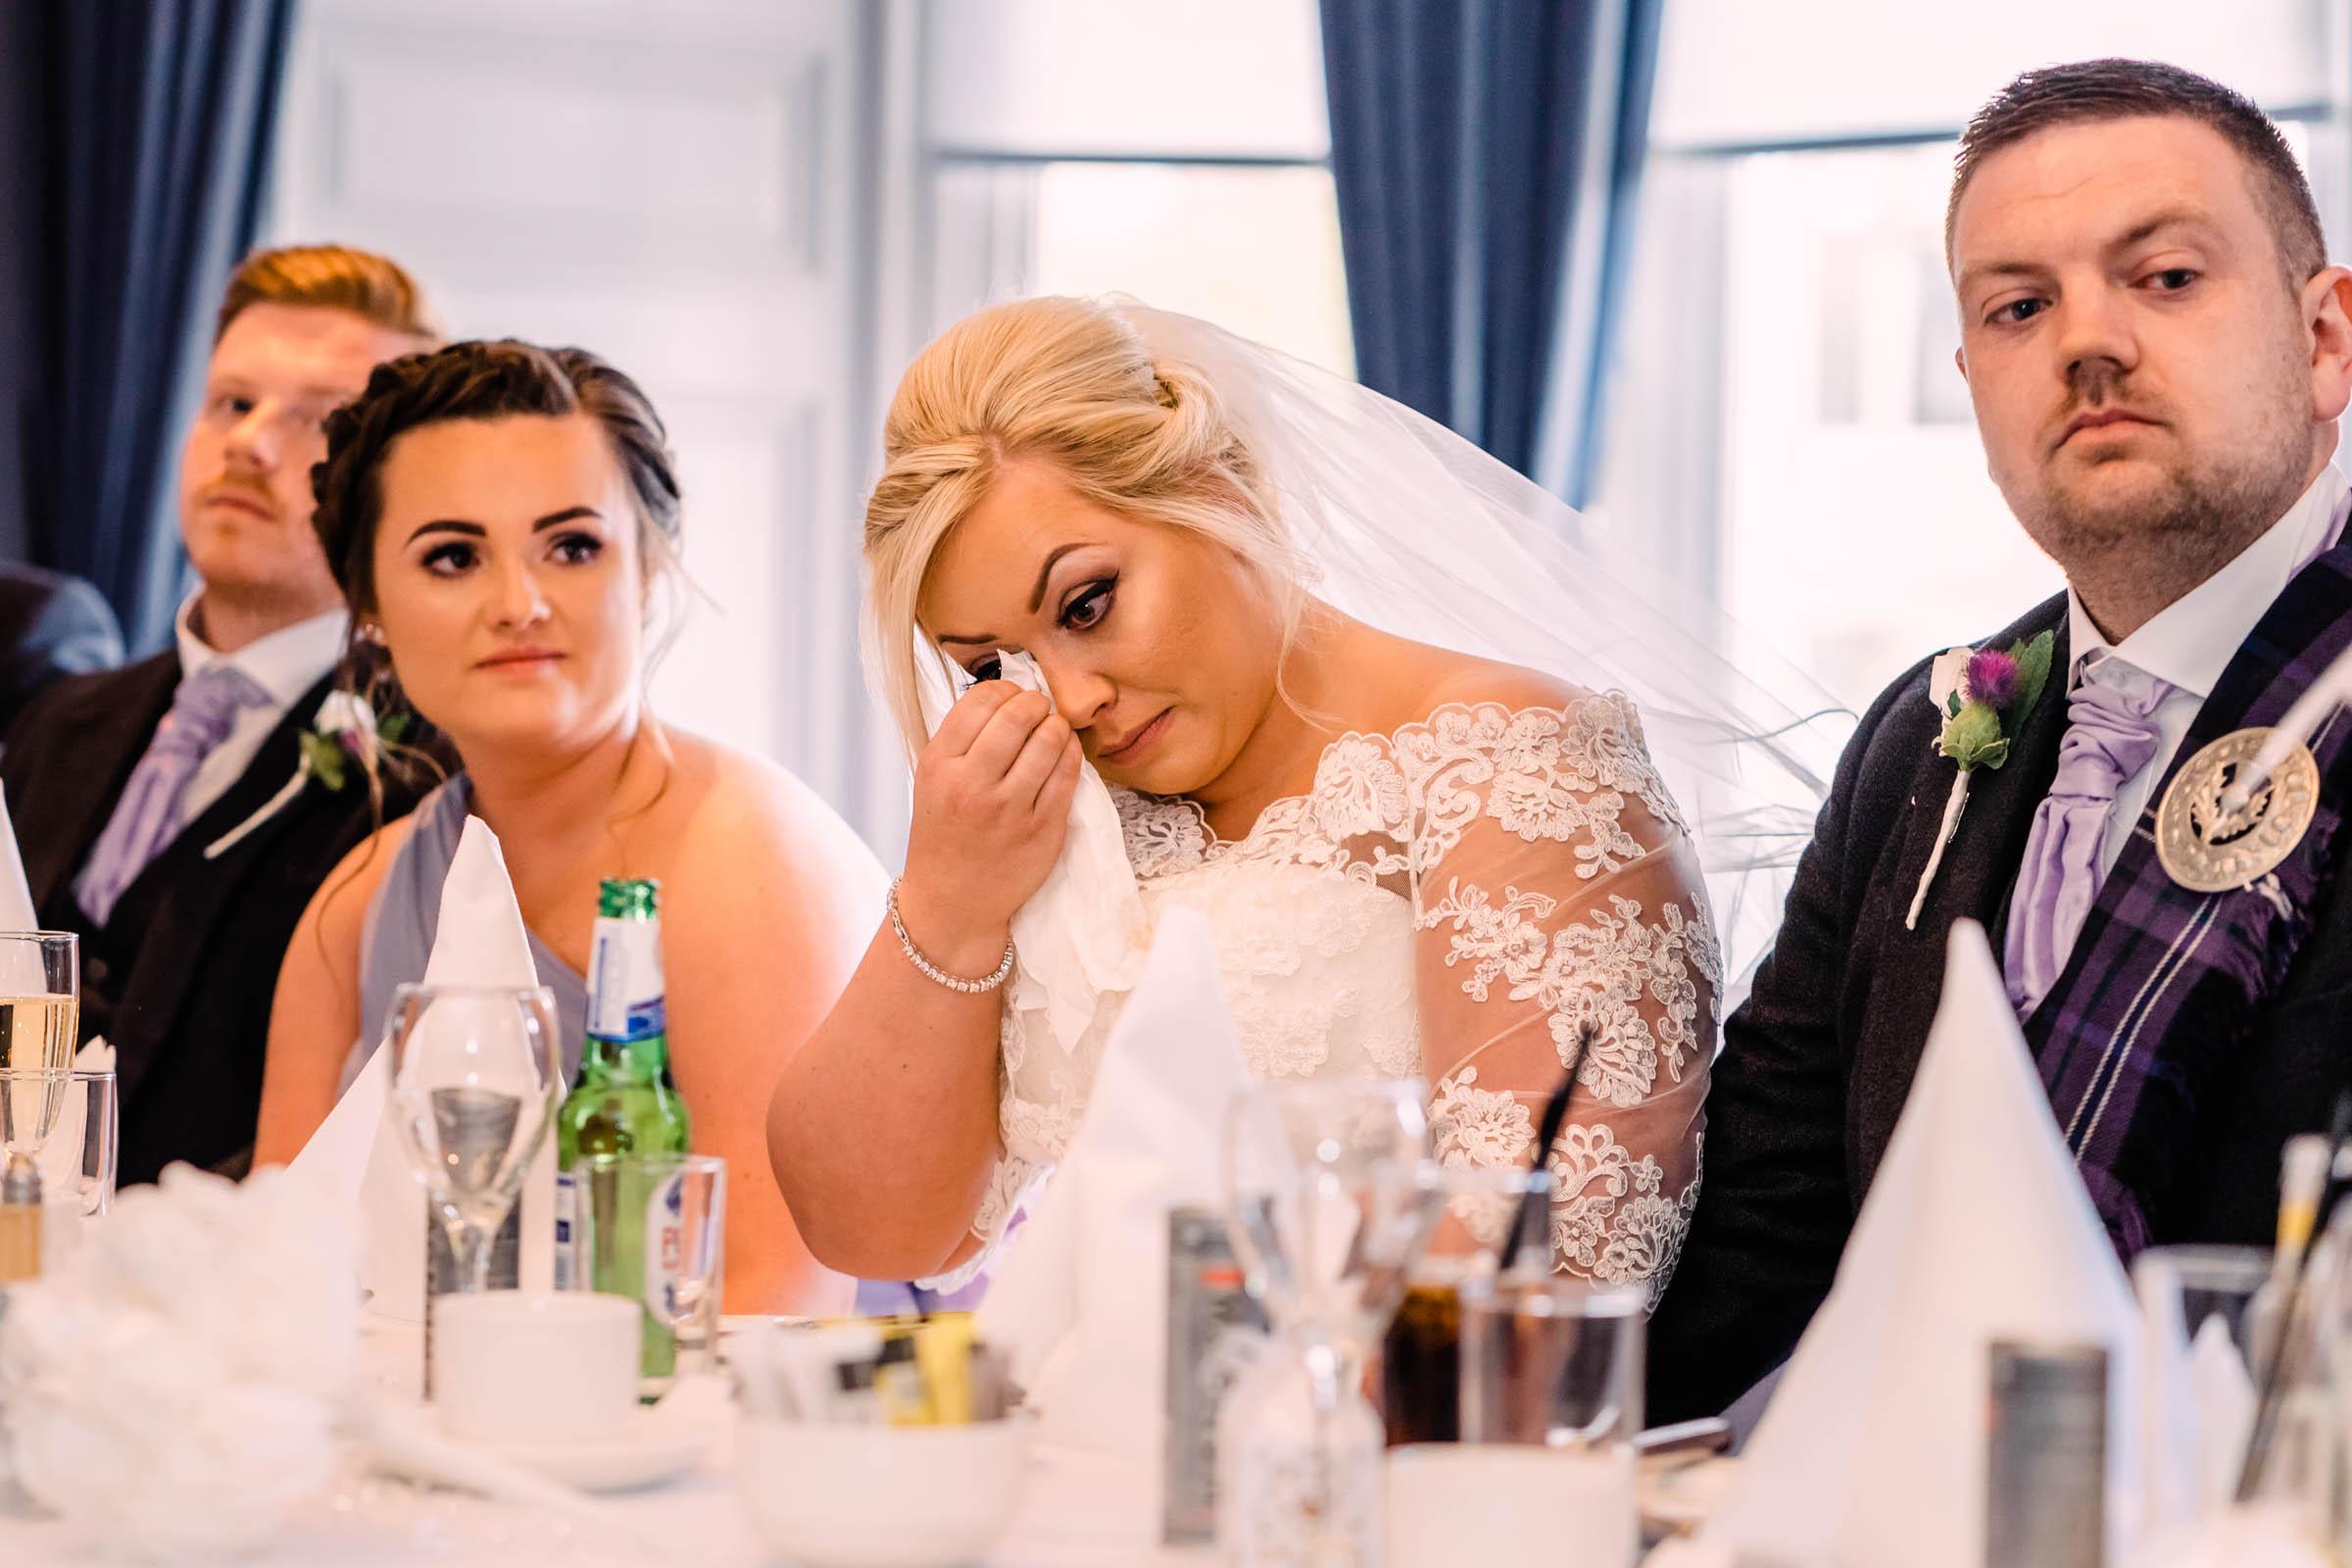 motherwell-moorings-wedding-photographer-dearlyphotography (65 of 77).jpg